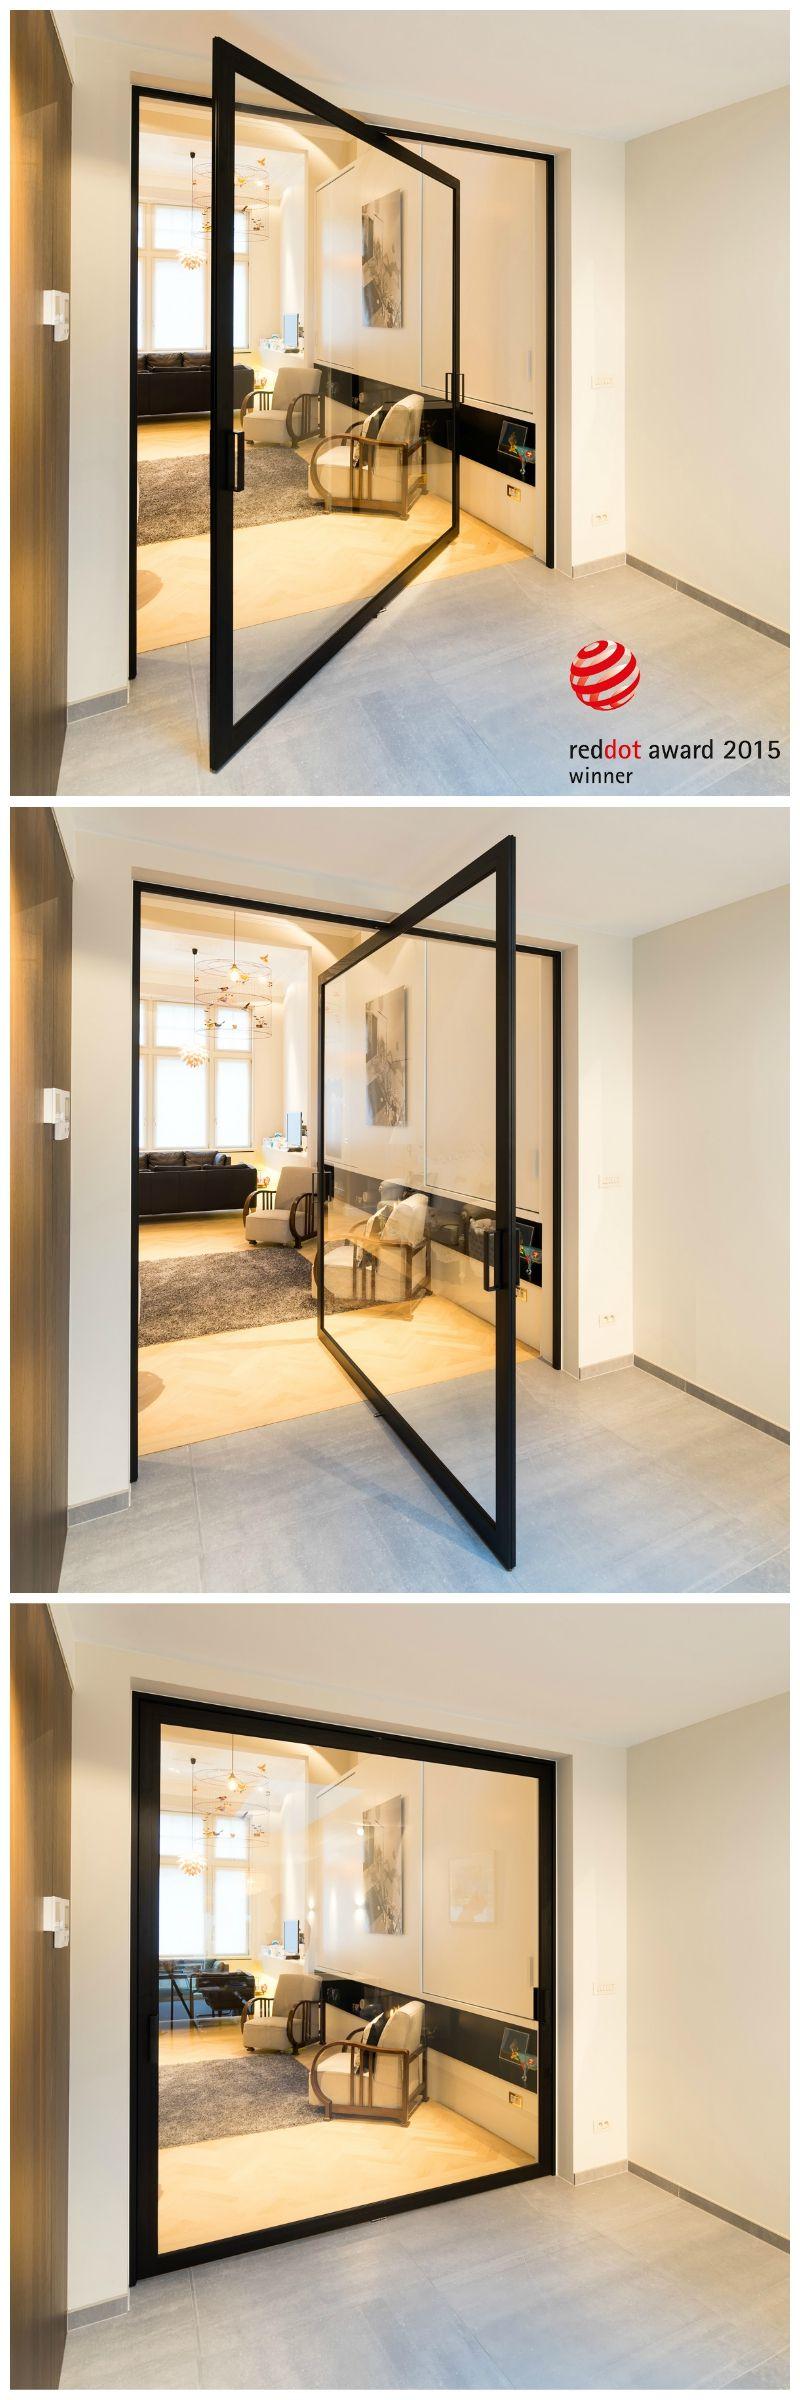 porte en verre sur pivot moderne terrasses pinterest portes vitr es int rieures portes. Black Bedroom Furniture Sets. Home Design Ideas